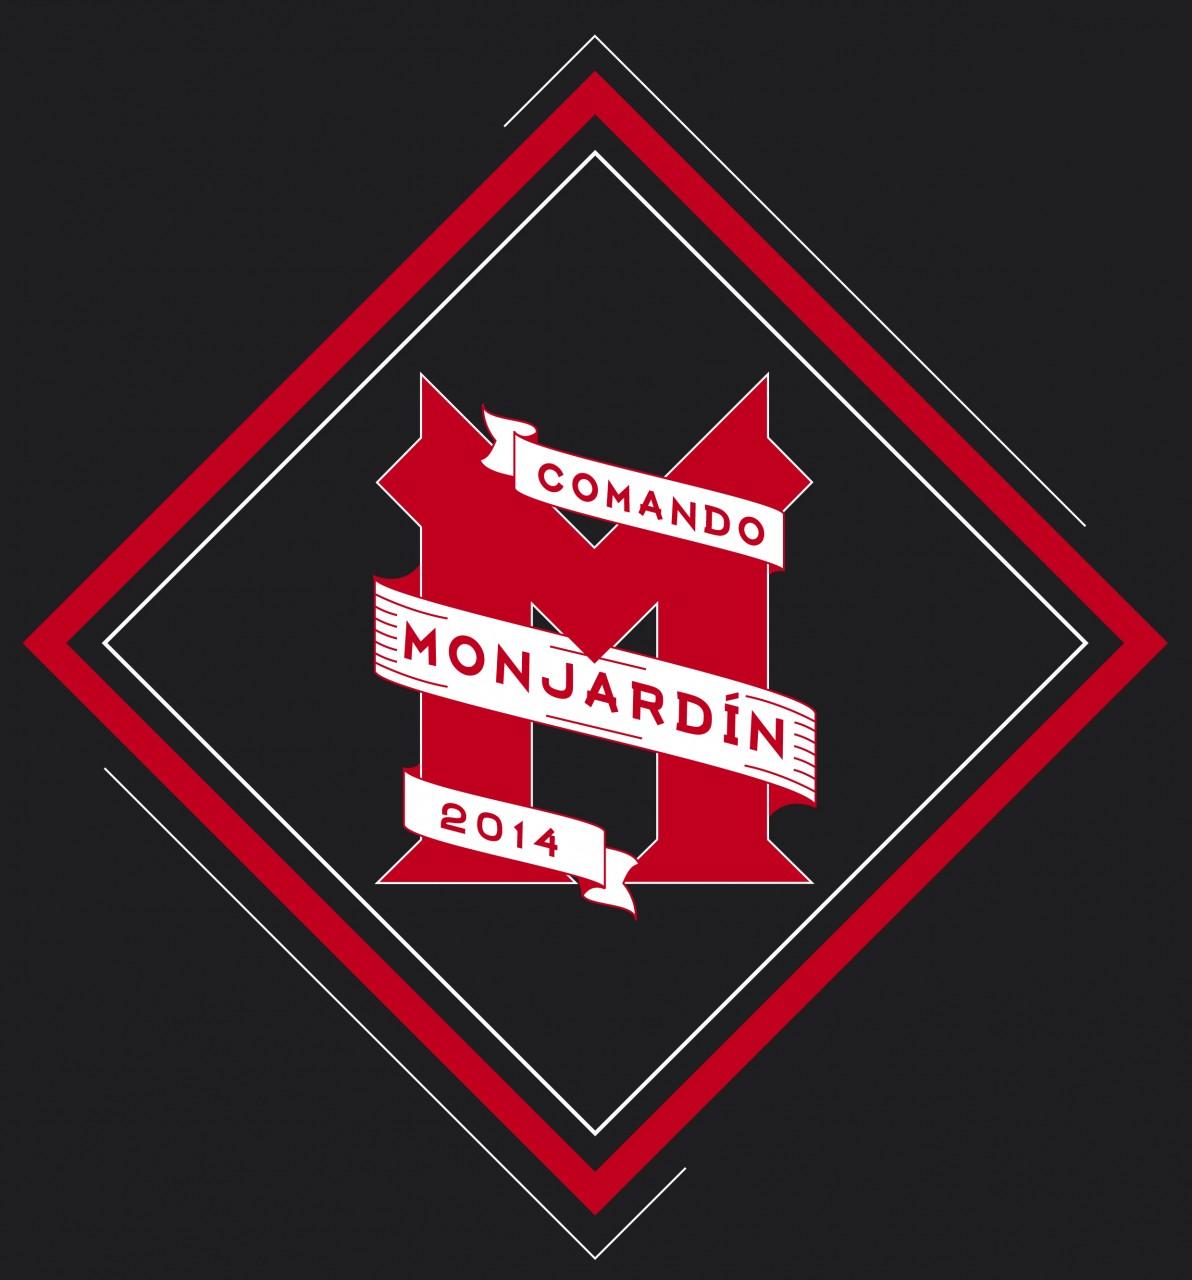 Monjardin_MIX_OK